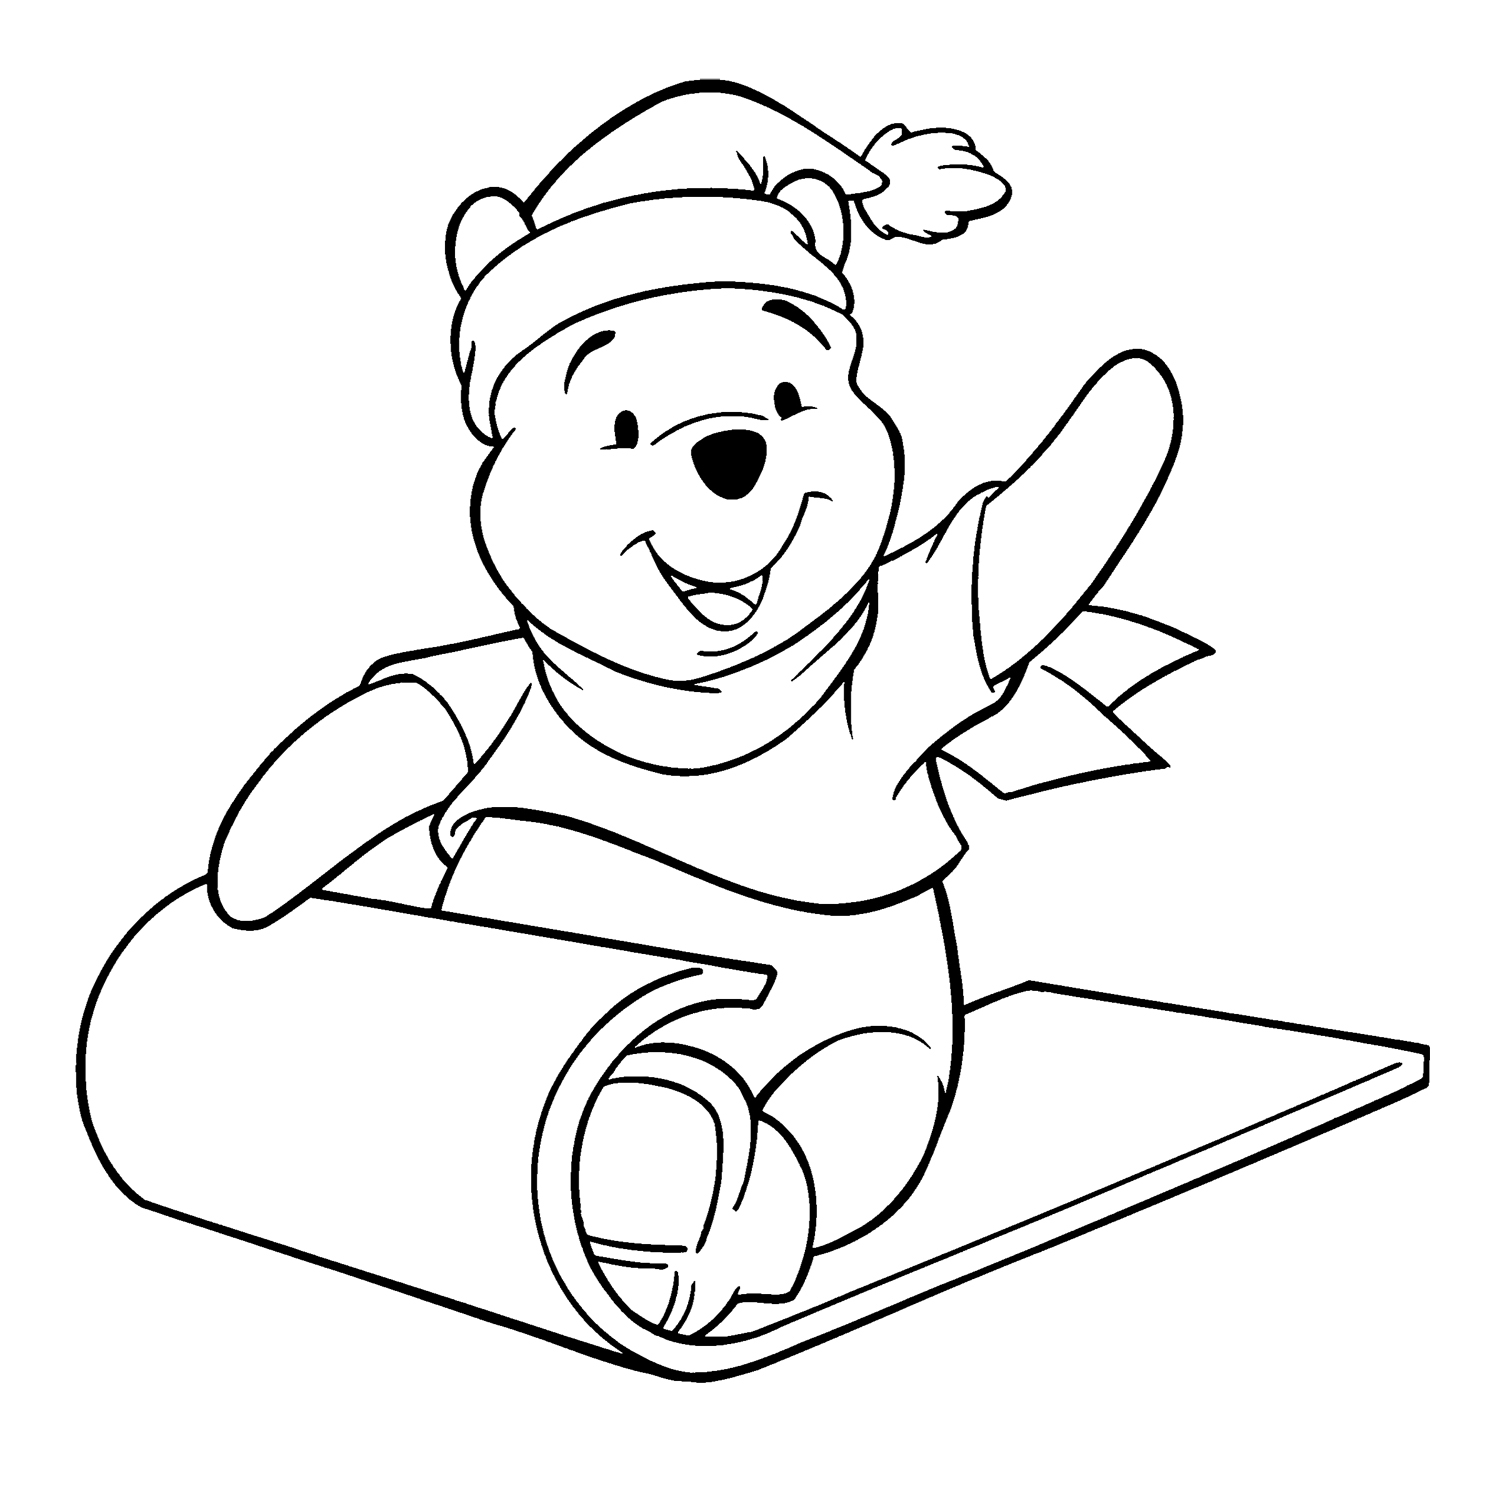 Winnie The Pooh Drawing At Getdrawings